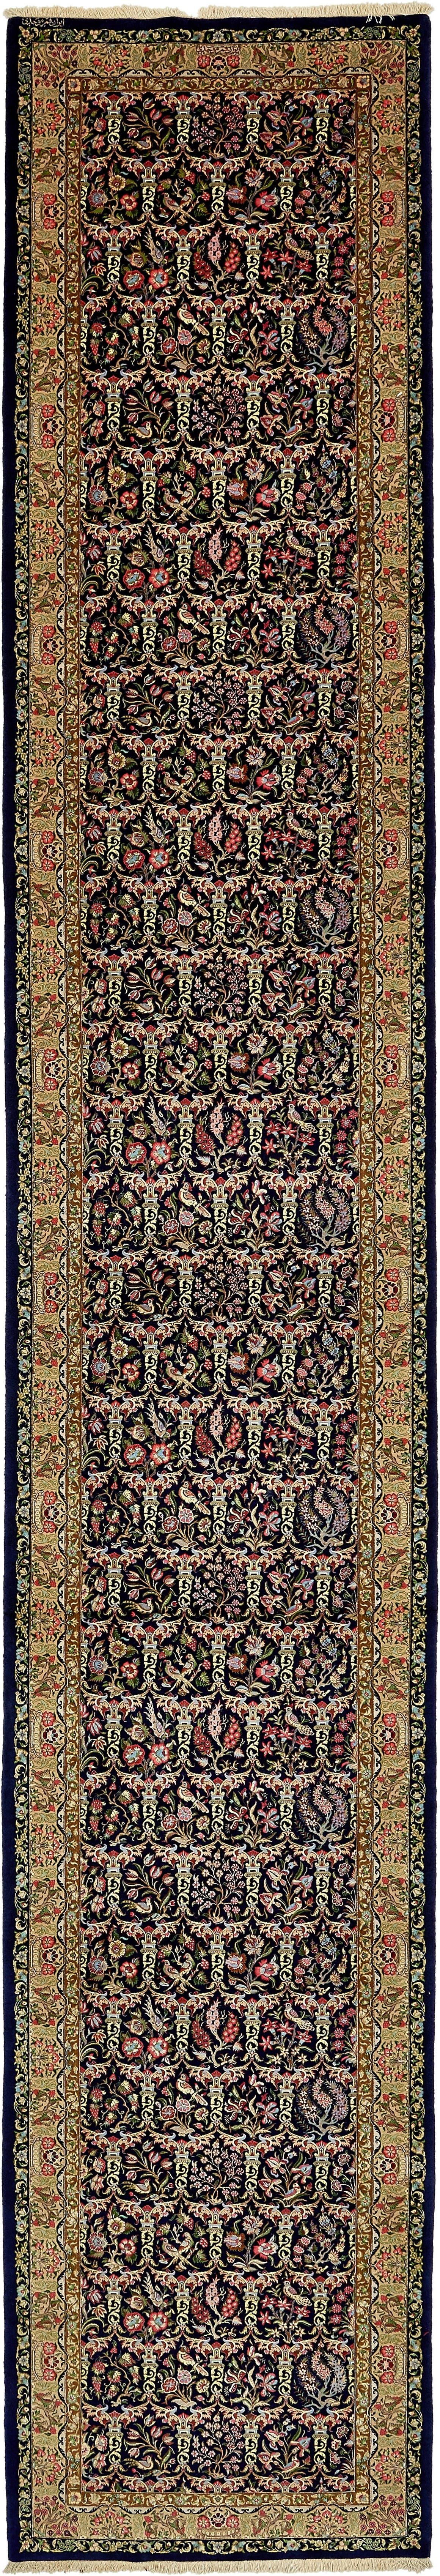 3' 4 x 20' 3 Qom Persian Runner Rug main image